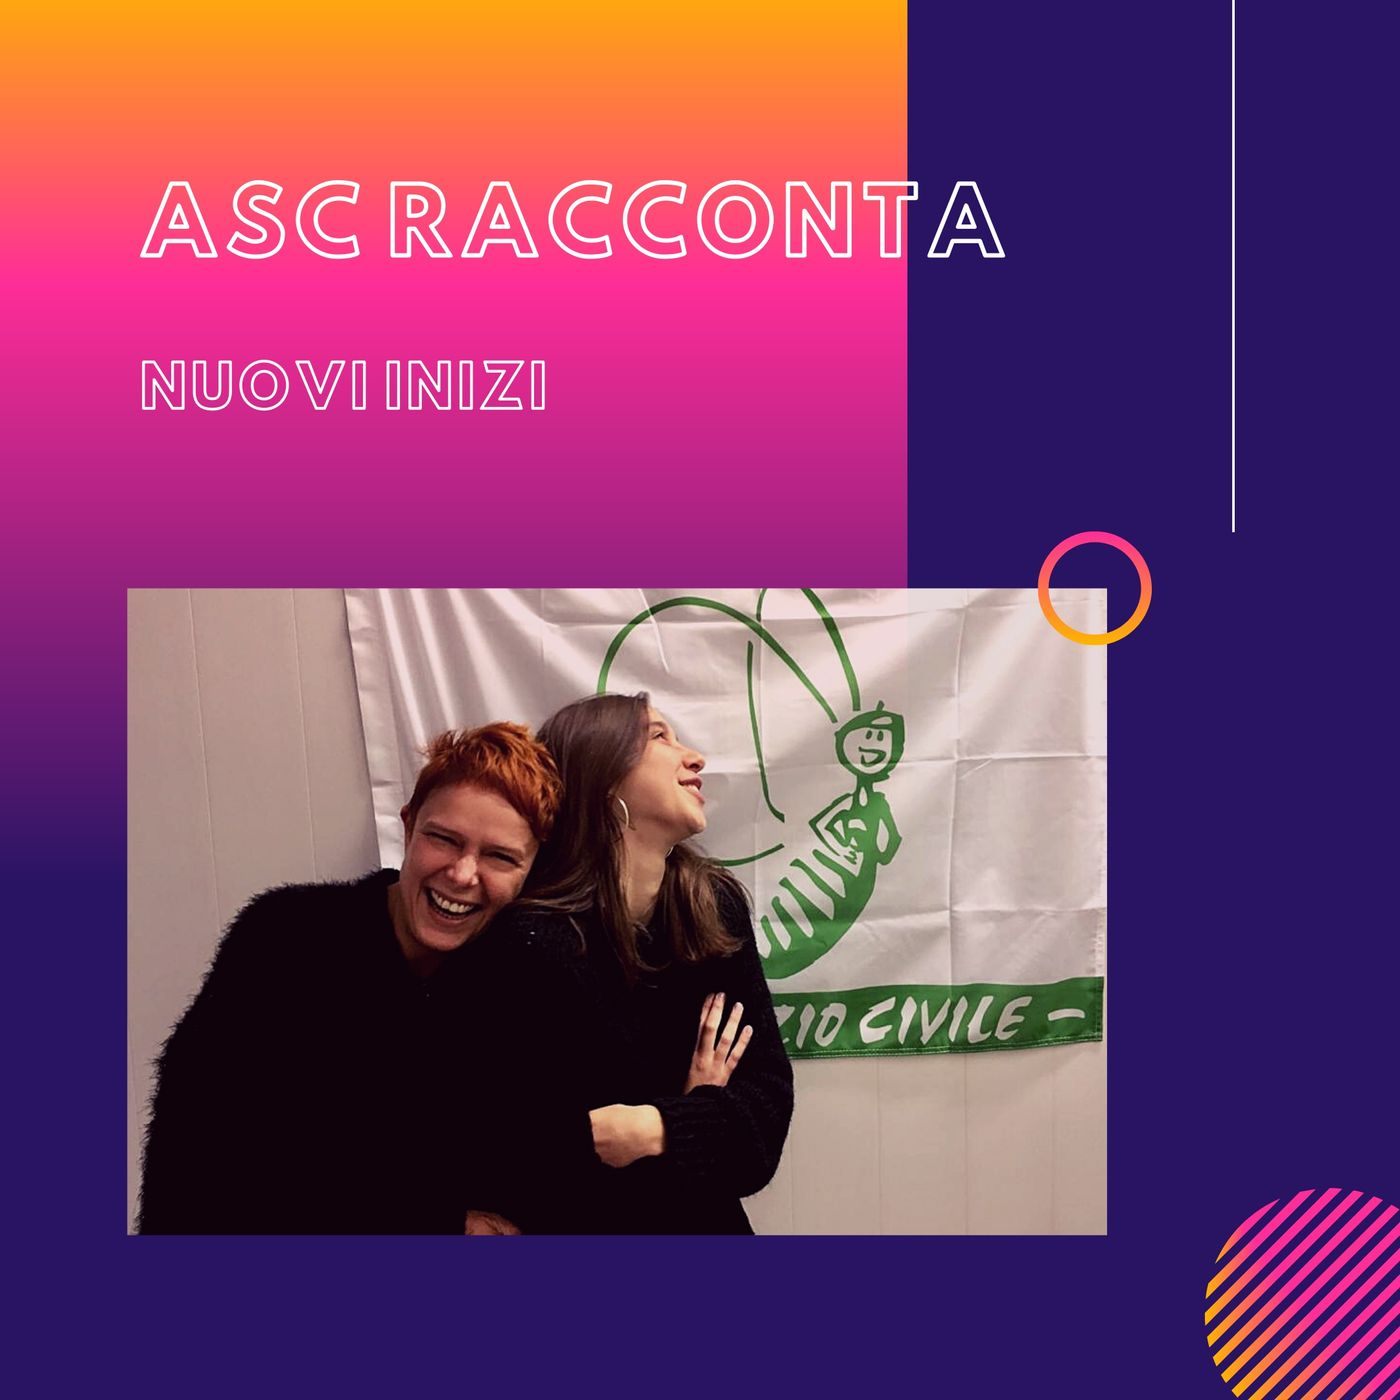 ASC RACCONTA - Nuovi inizi